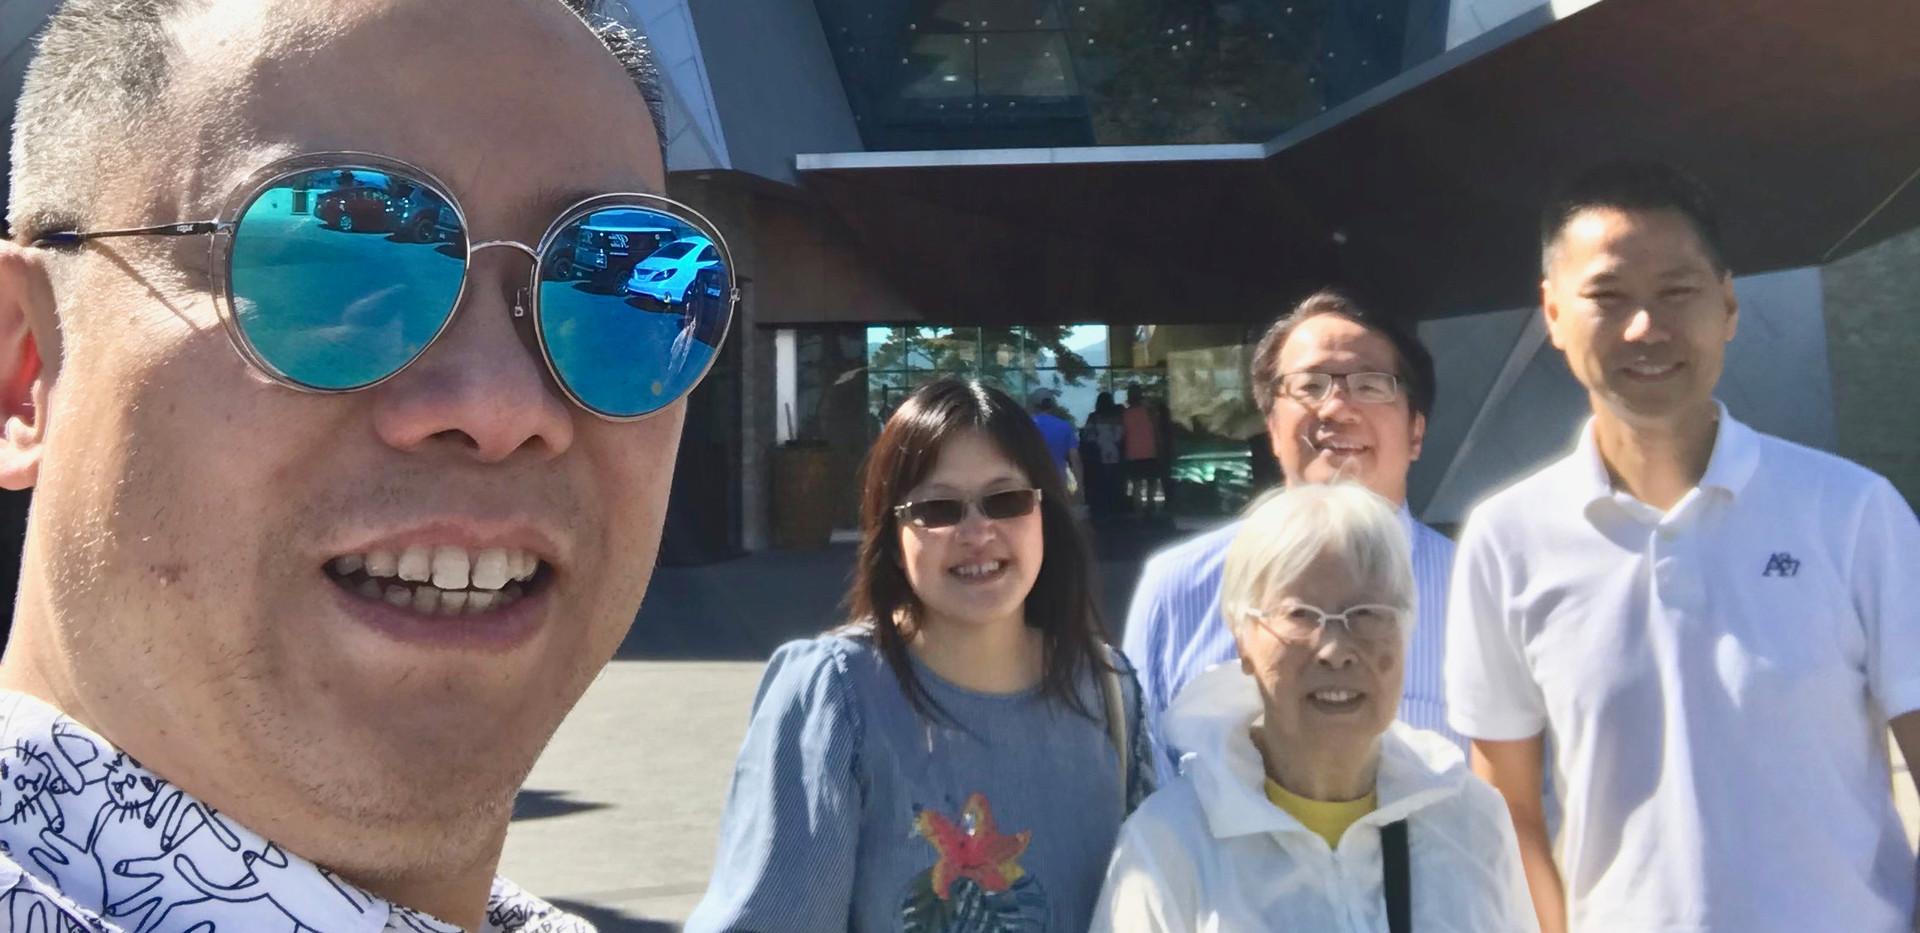 Ice Hotel BC, Canada May 2018